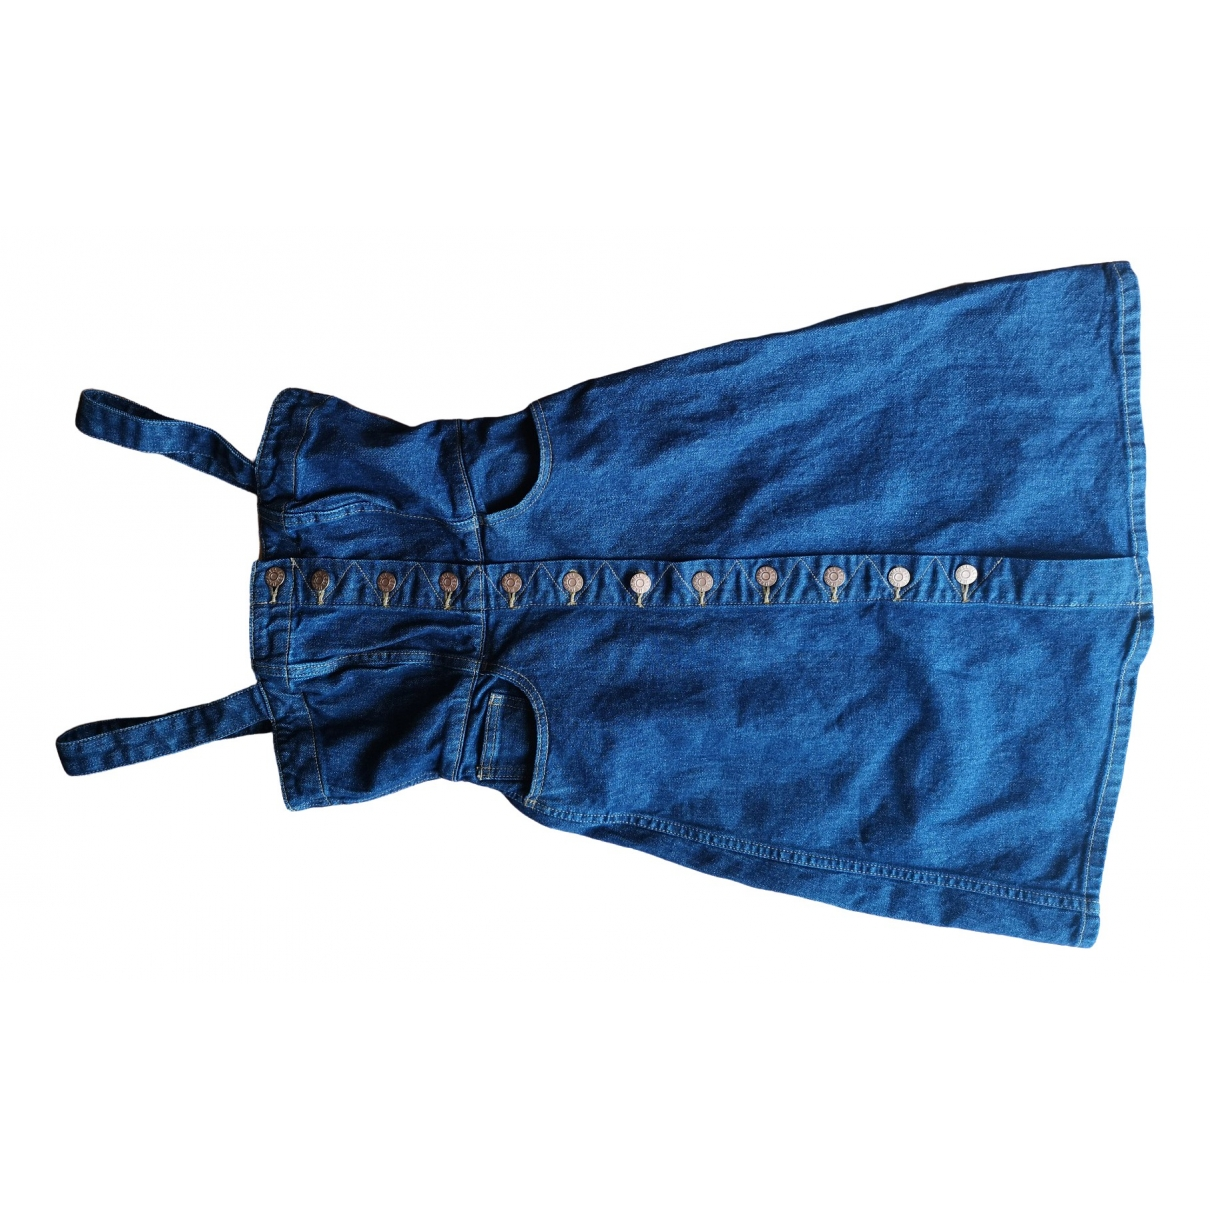 Madewell - Robe   pour femme en denim - bleu